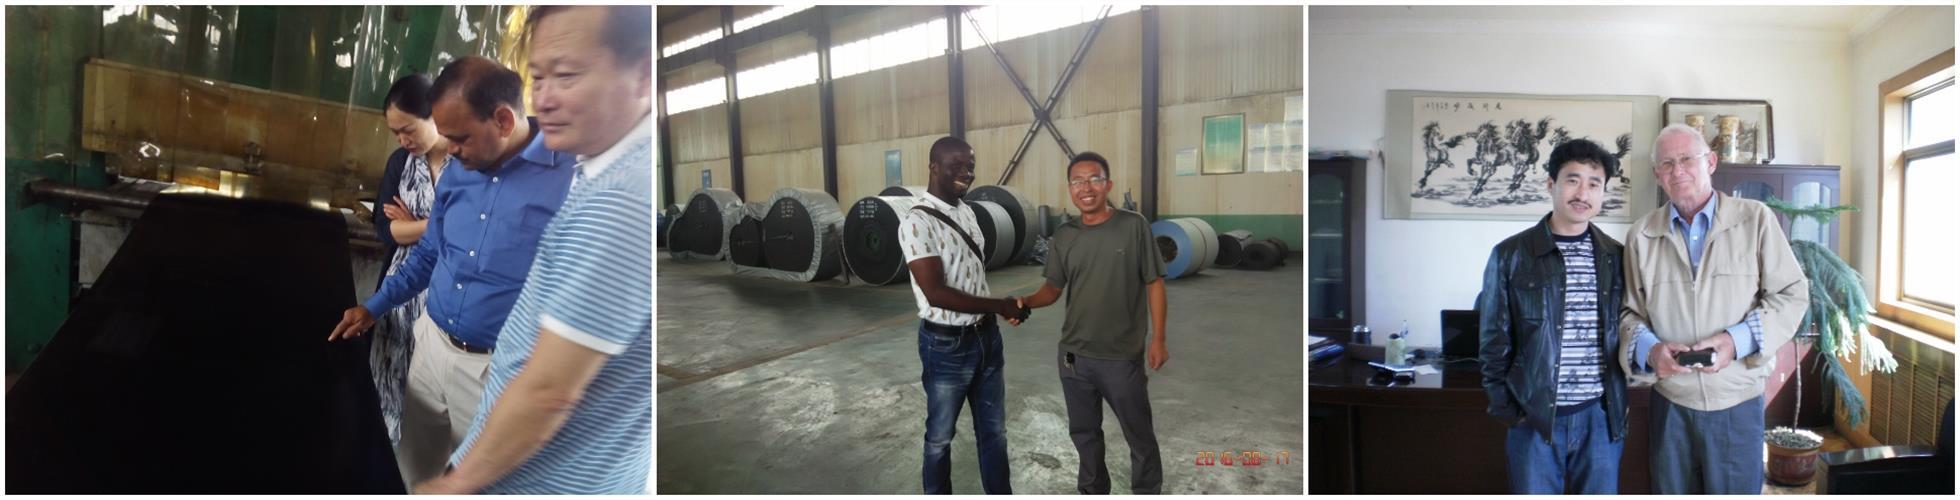 customer visit company photos